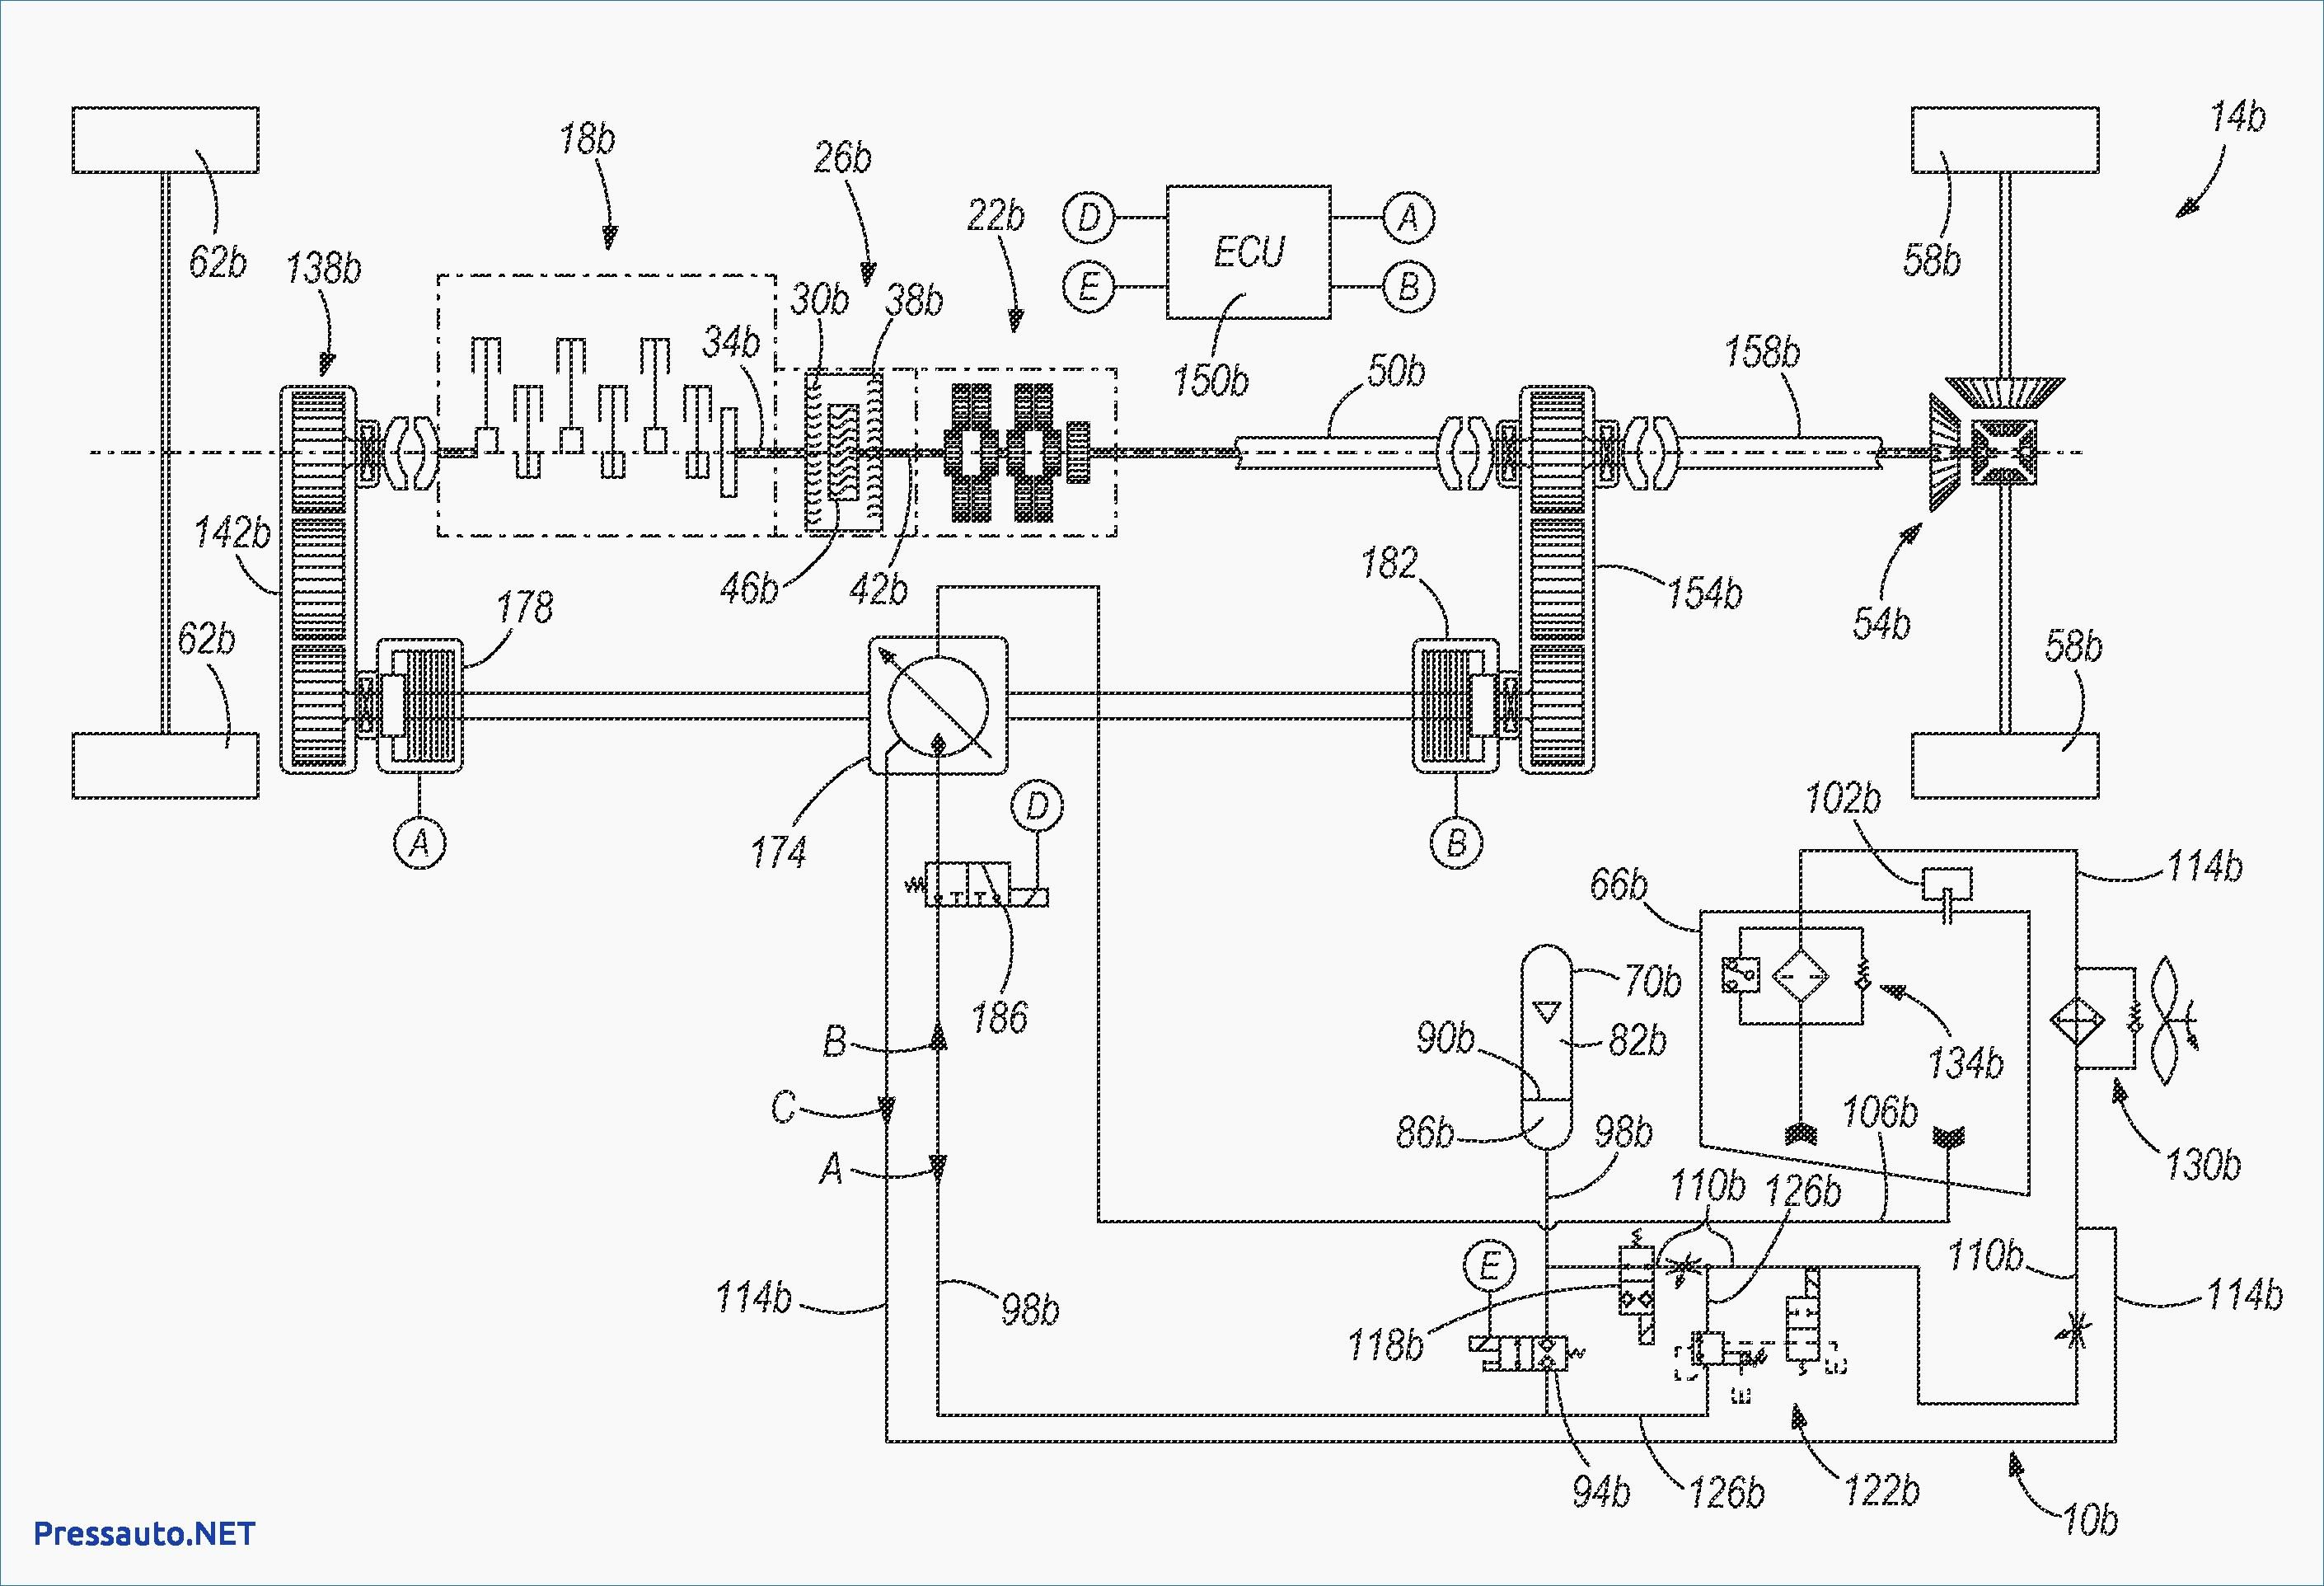 1991 International Truck Wiring Diagram | Manual E-Books - International Truck Wiring Diagram